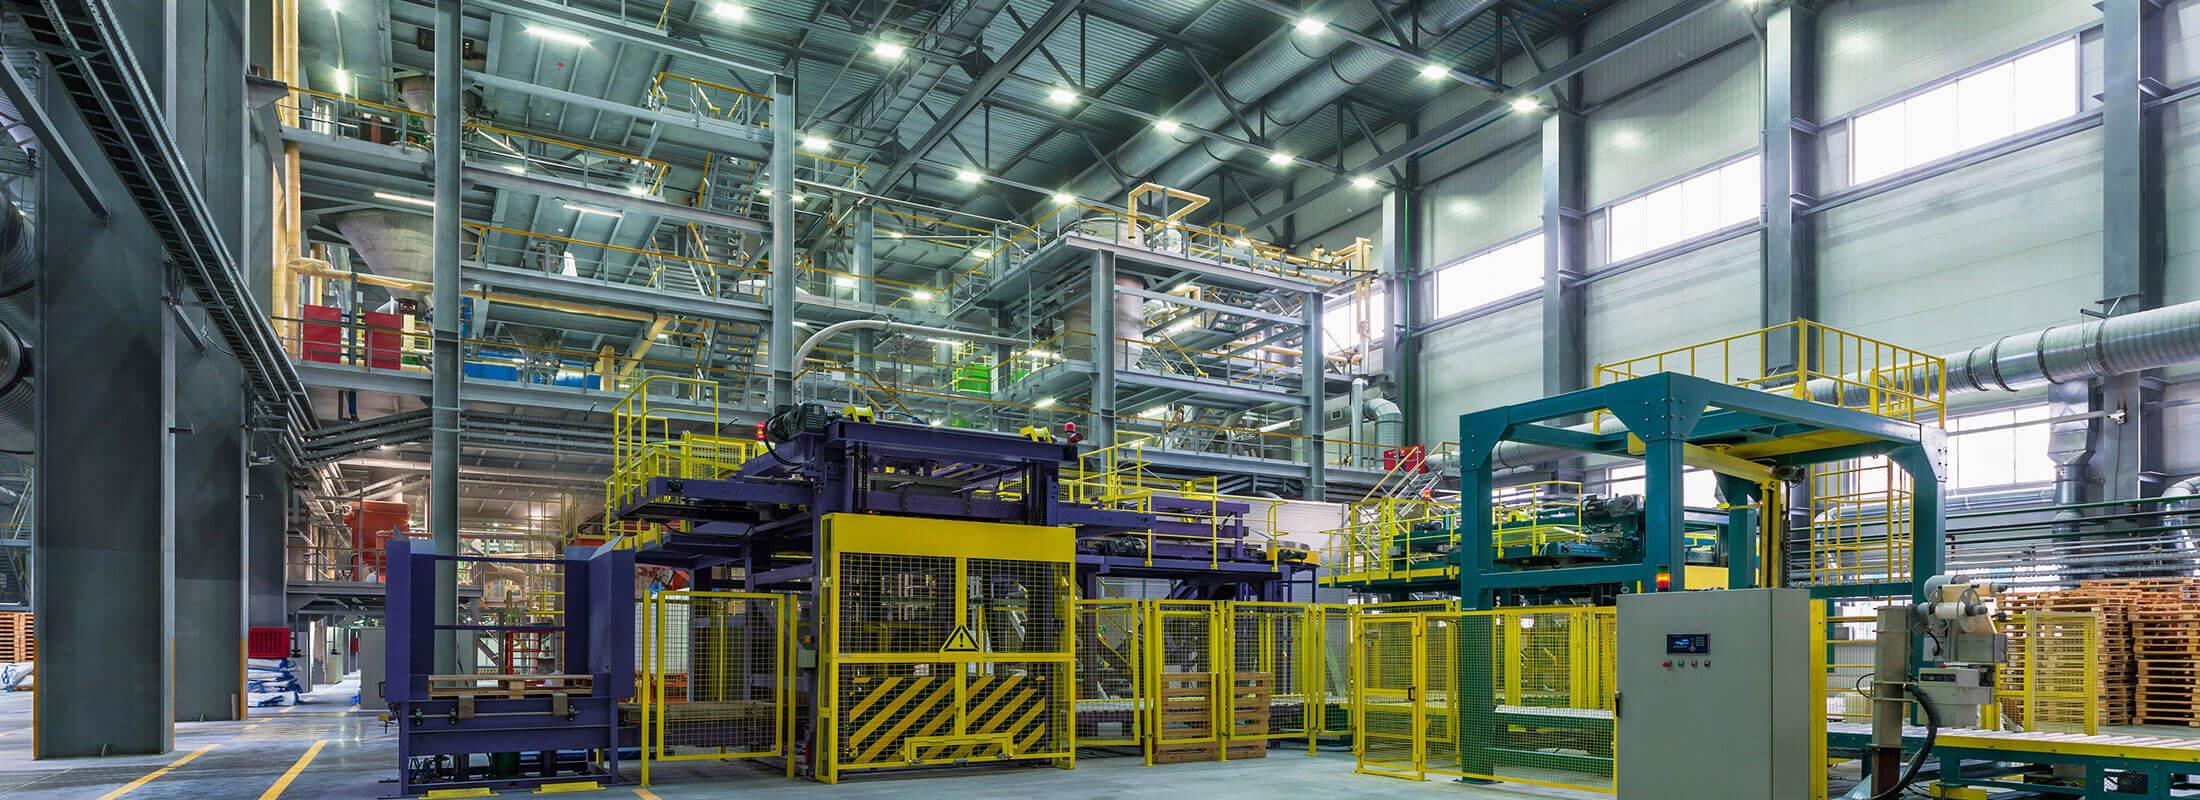 industrial slider